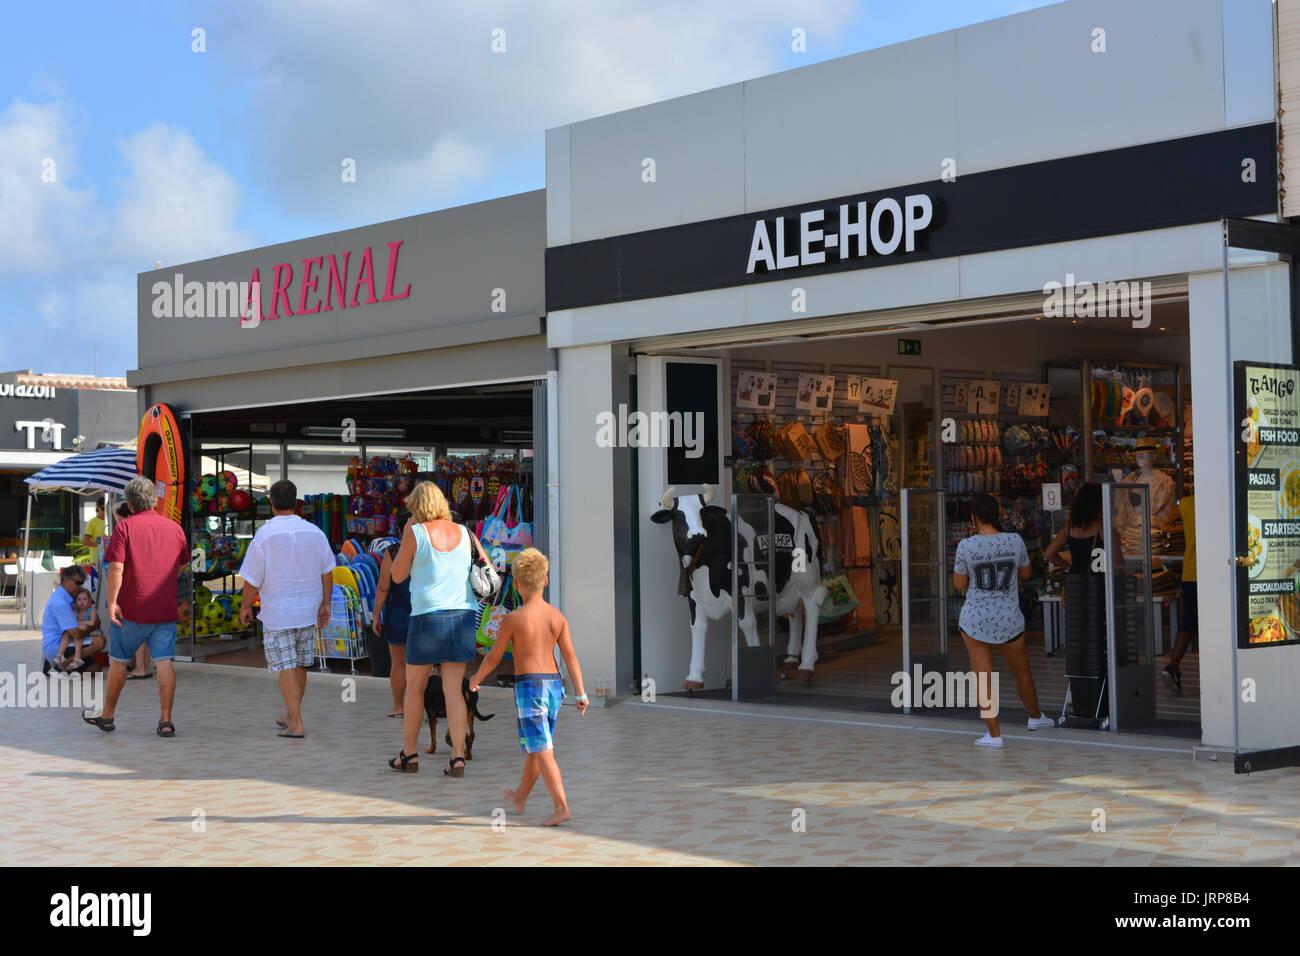 aa9759aa2 Outdoors Shops Spanish Stock Photos & Outdoors Shops Spanish Stock ...